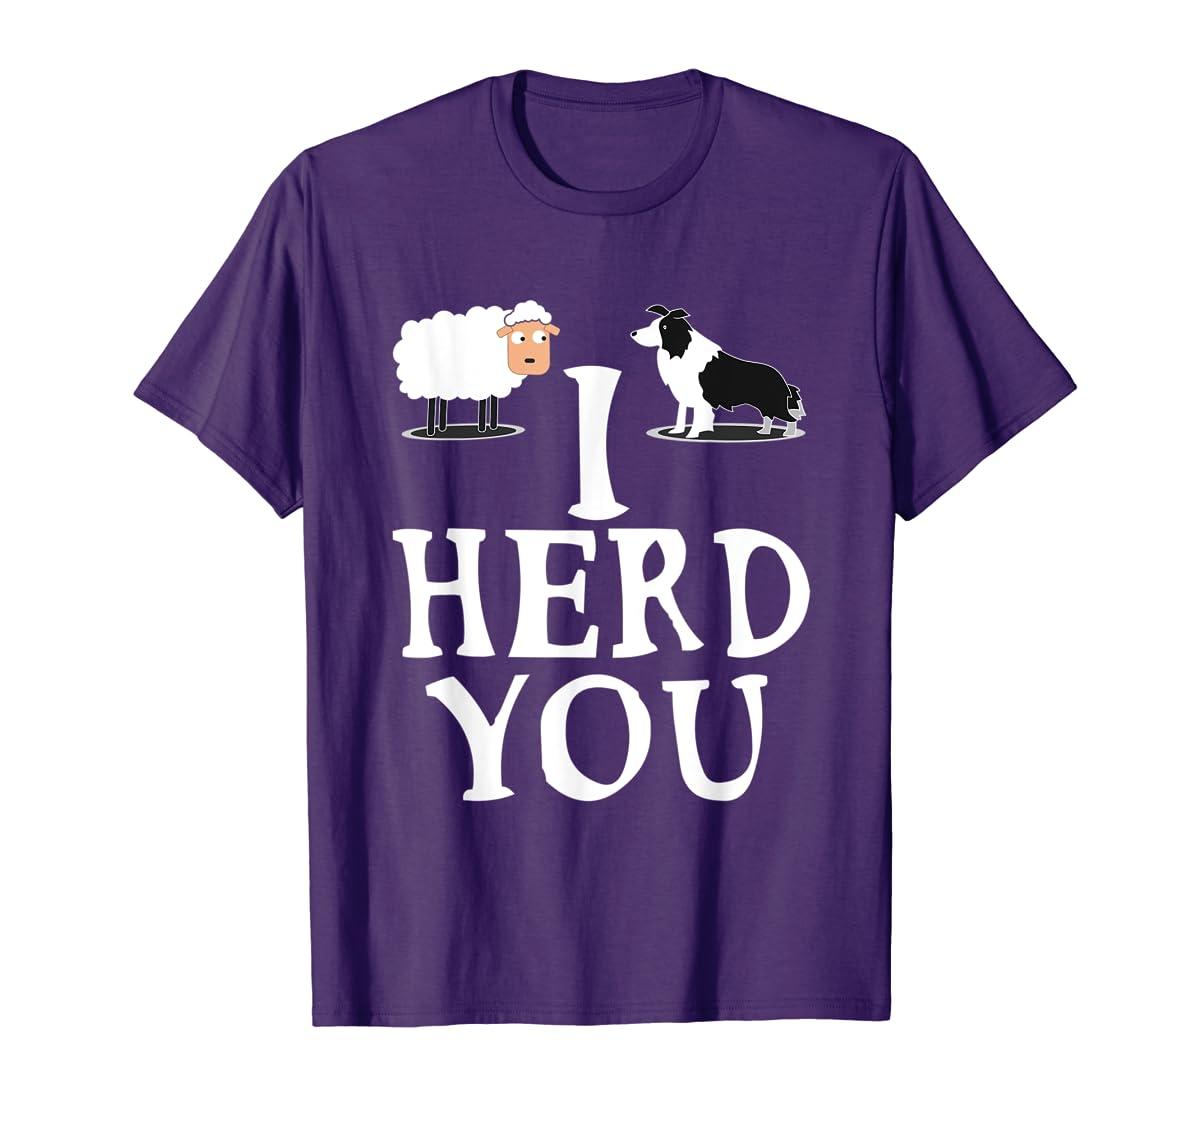 I HERD YOU BORDER COLLIE T shirt Gifts for Men Women Kids-Men's T-Shirt-Purple